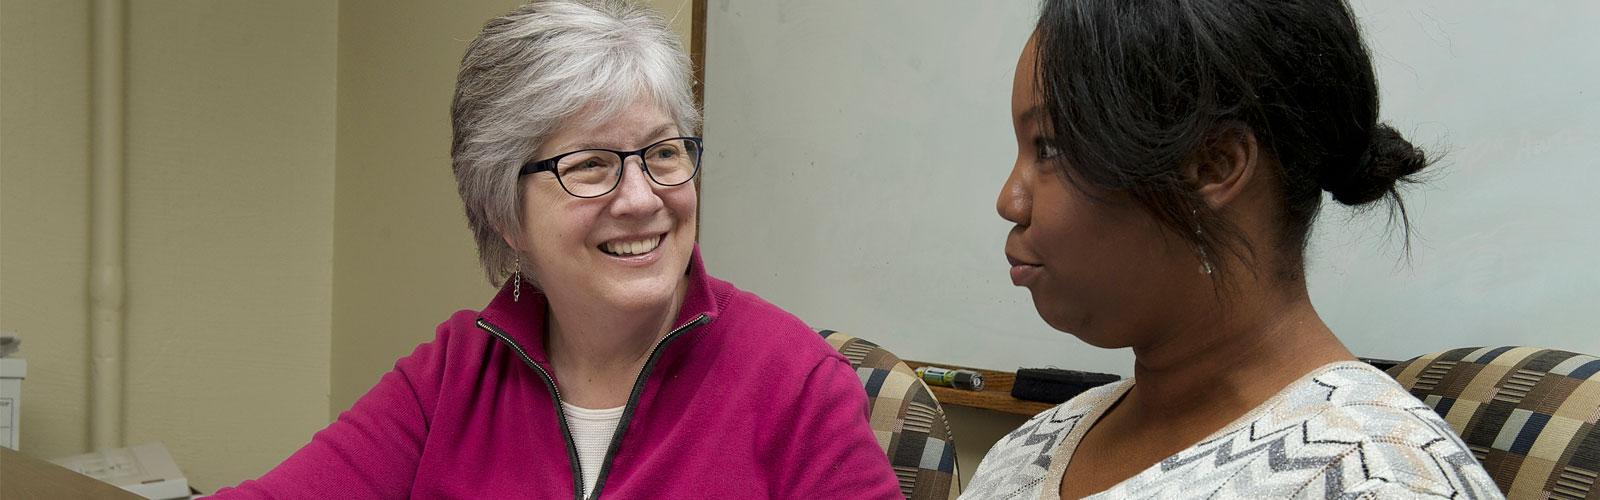 Julie Kalkowski and student at Creighton University